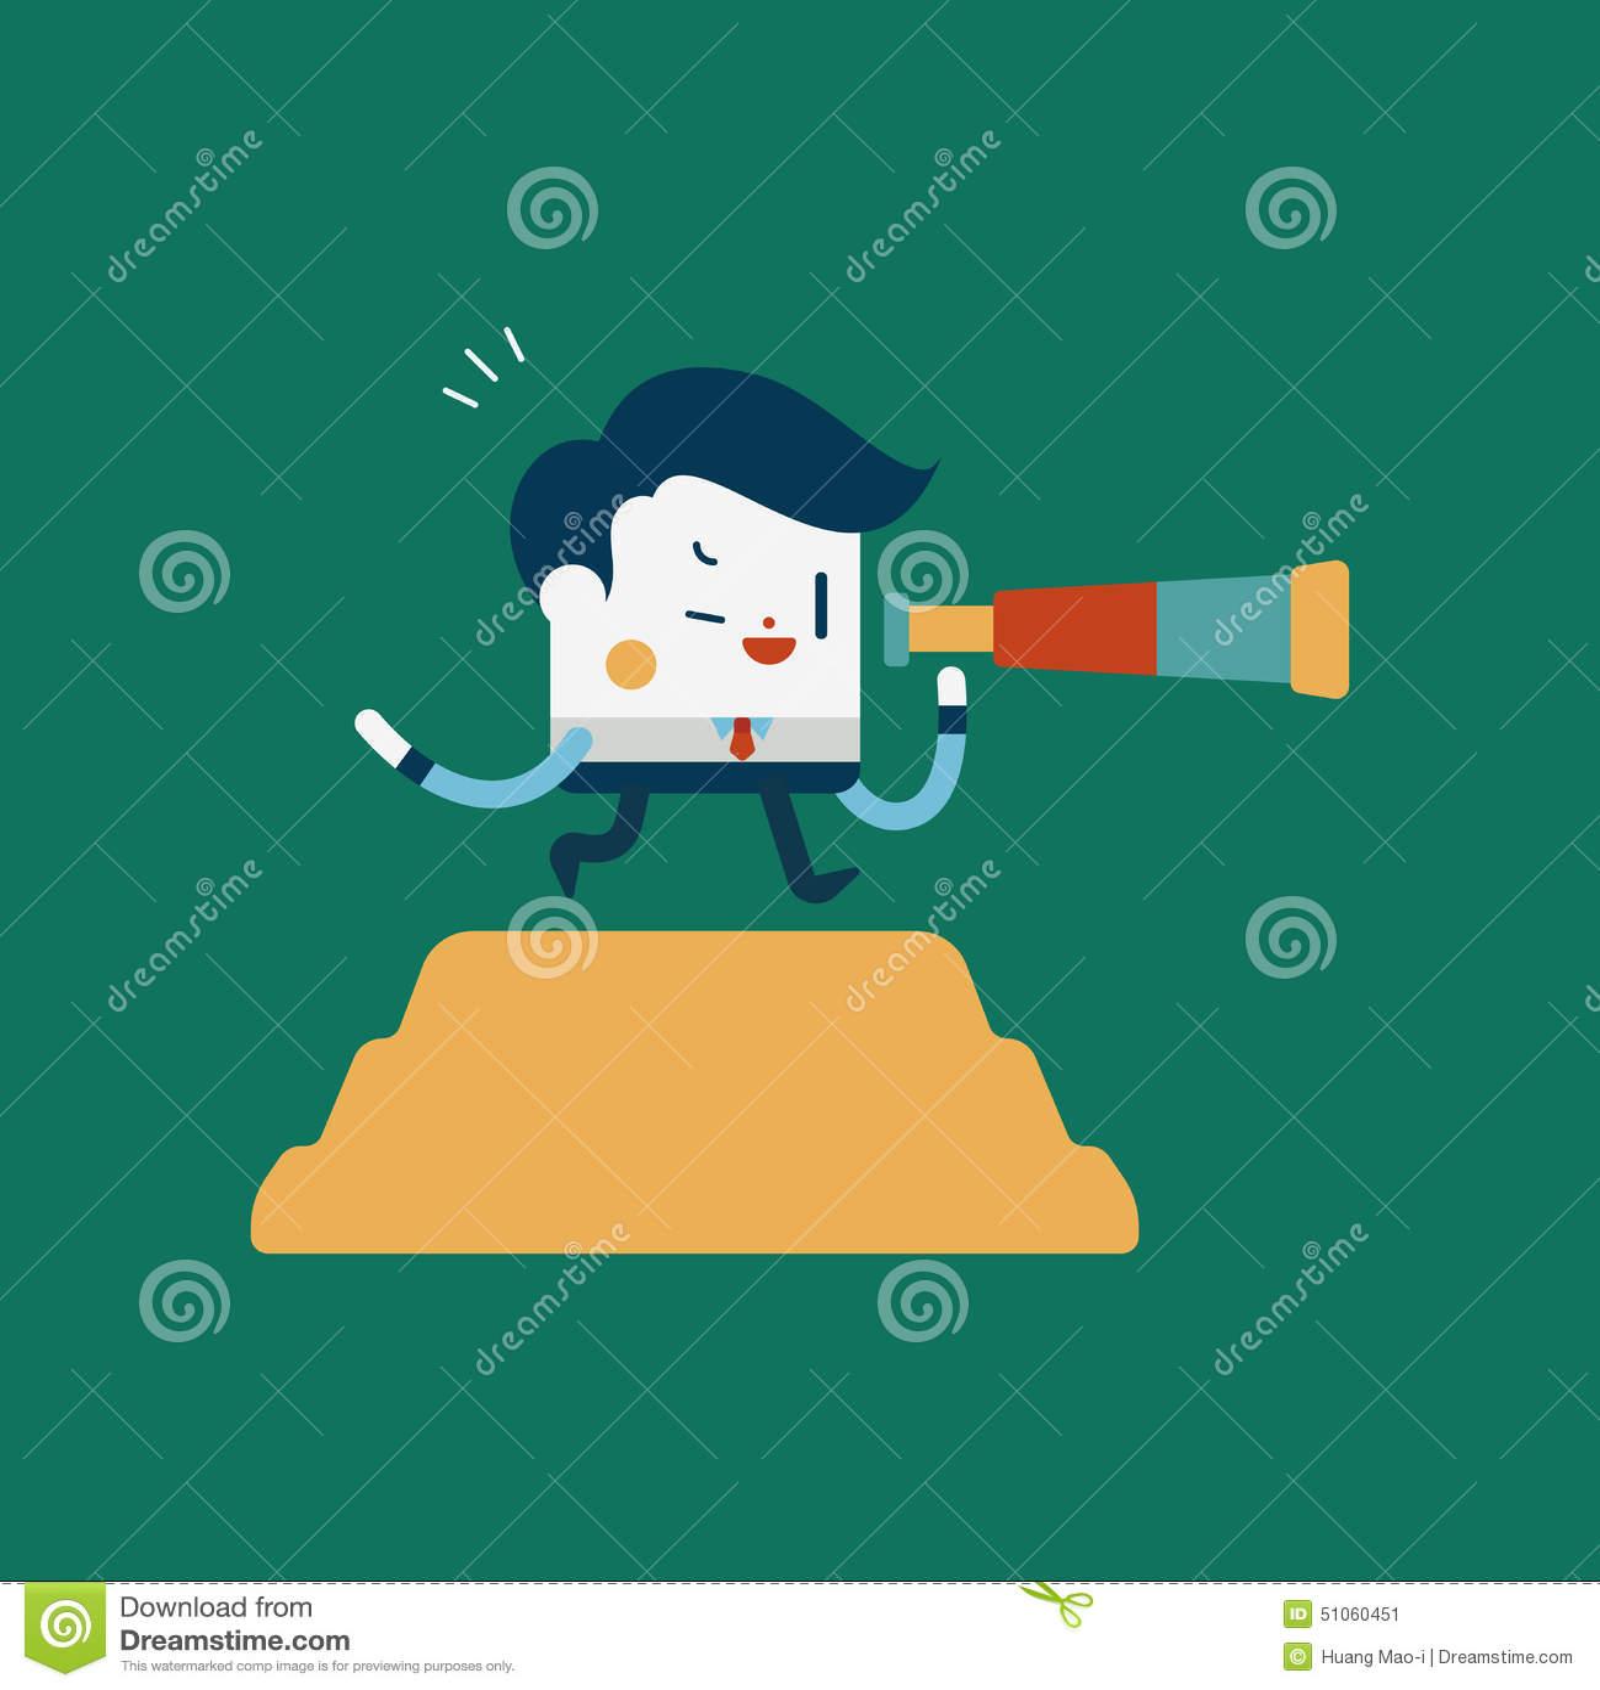 Cartoon Characters Looking Forward : Character illustration design businessman concept look